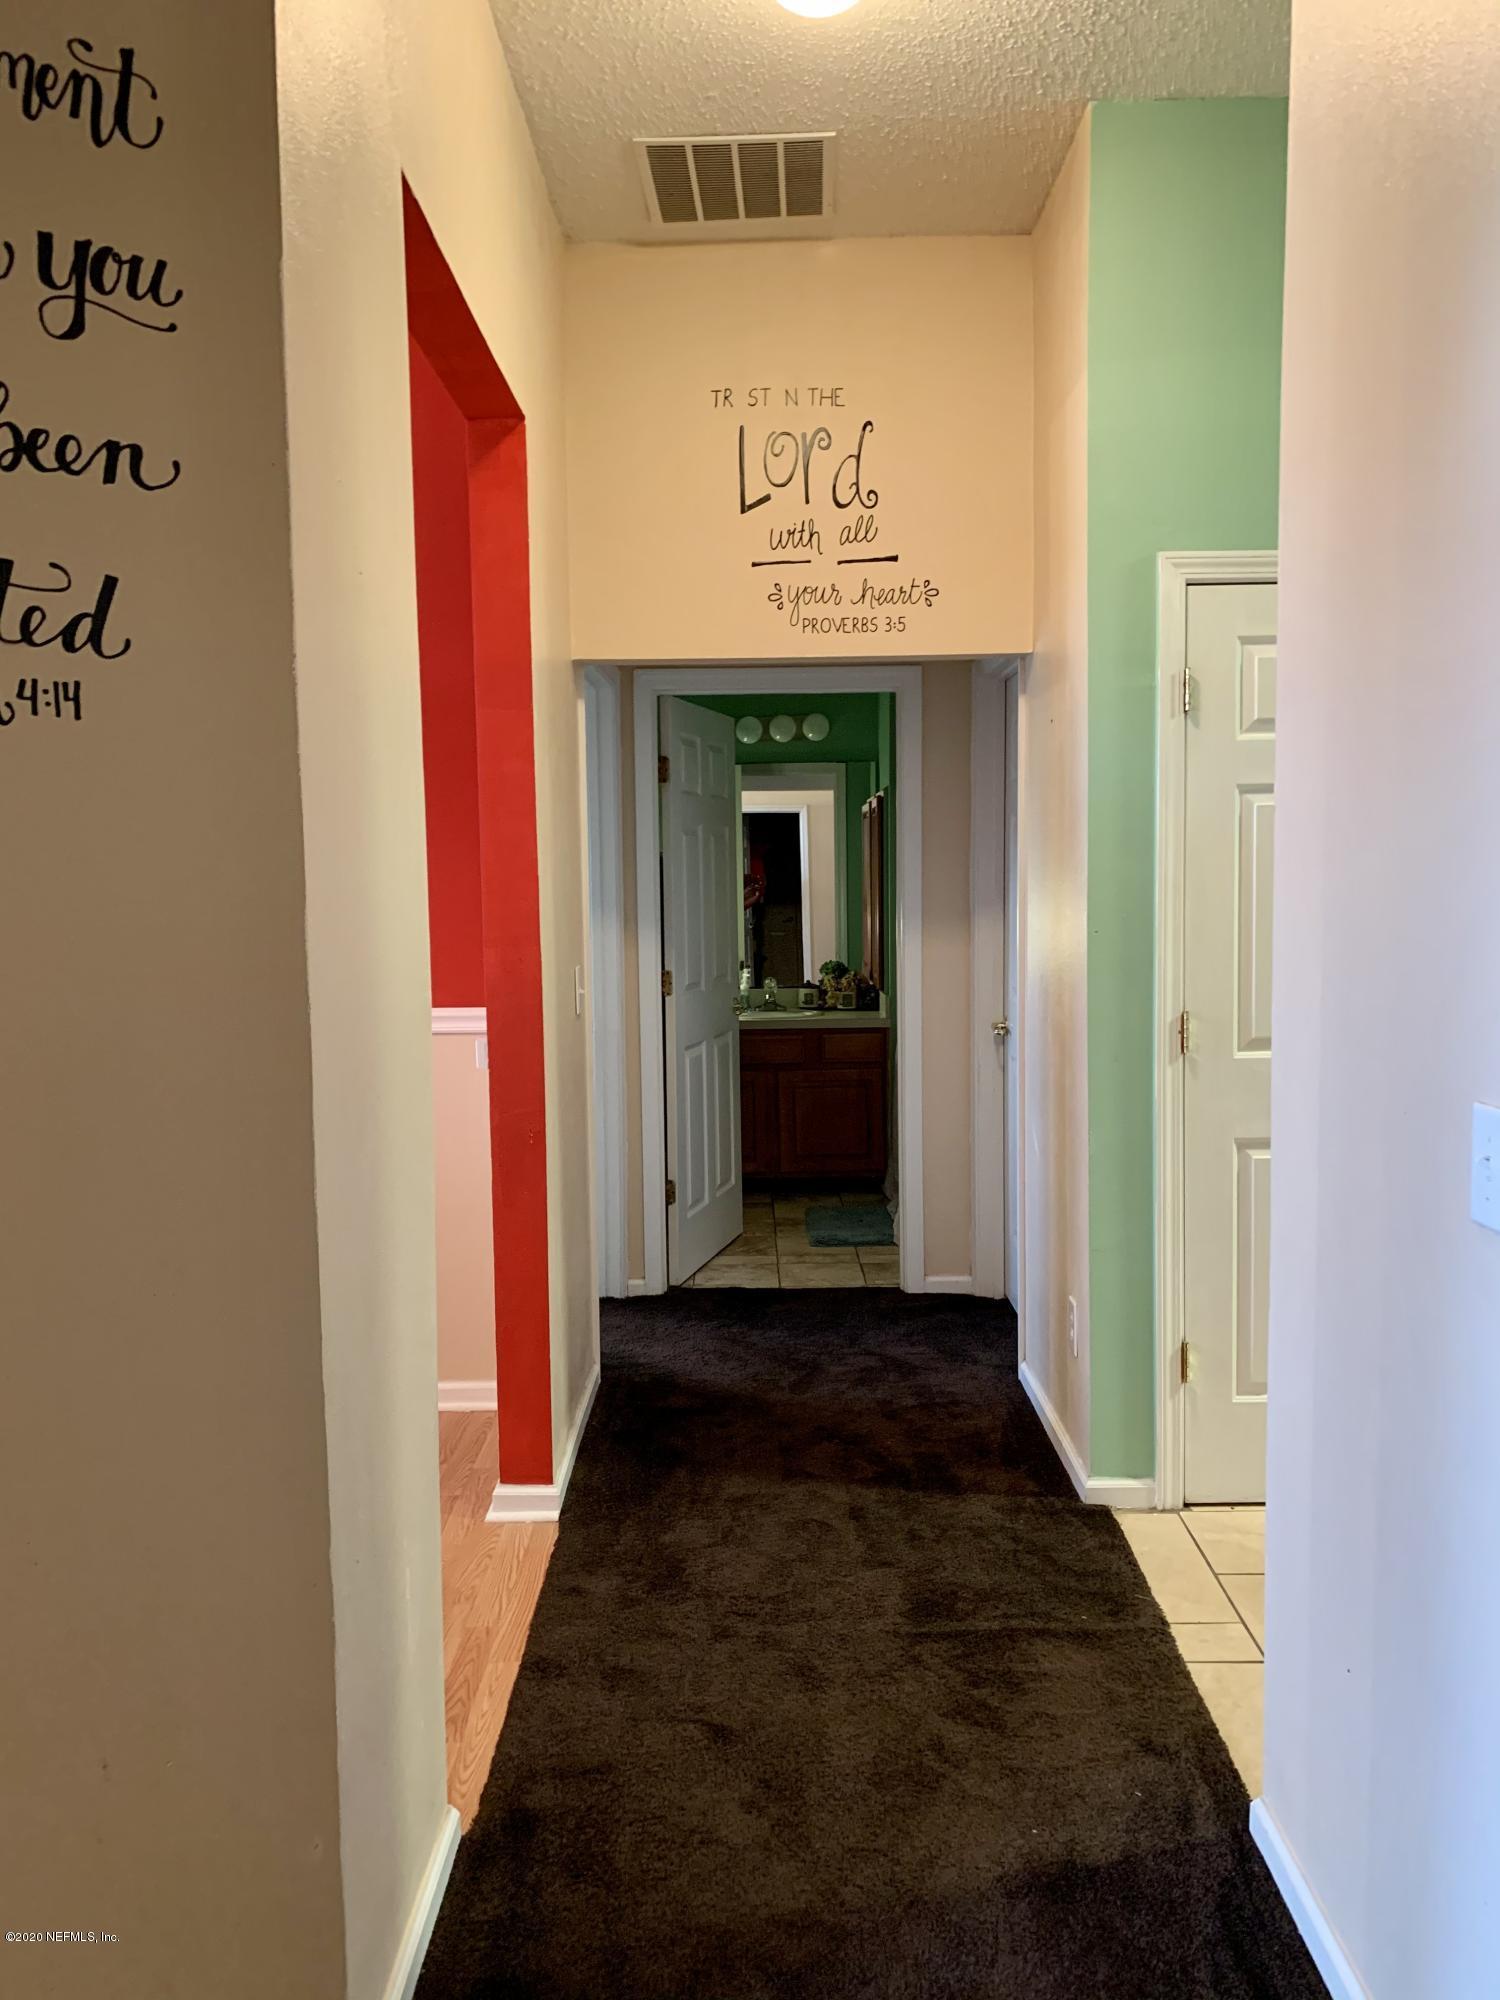 3401 NATALIE, JACKSONVILLE, FLORIDA 32218, 4 Bedrooms Bedrooms, ,2 BathroomsBathrooms,Residential,For sale,NATALIE,1082075